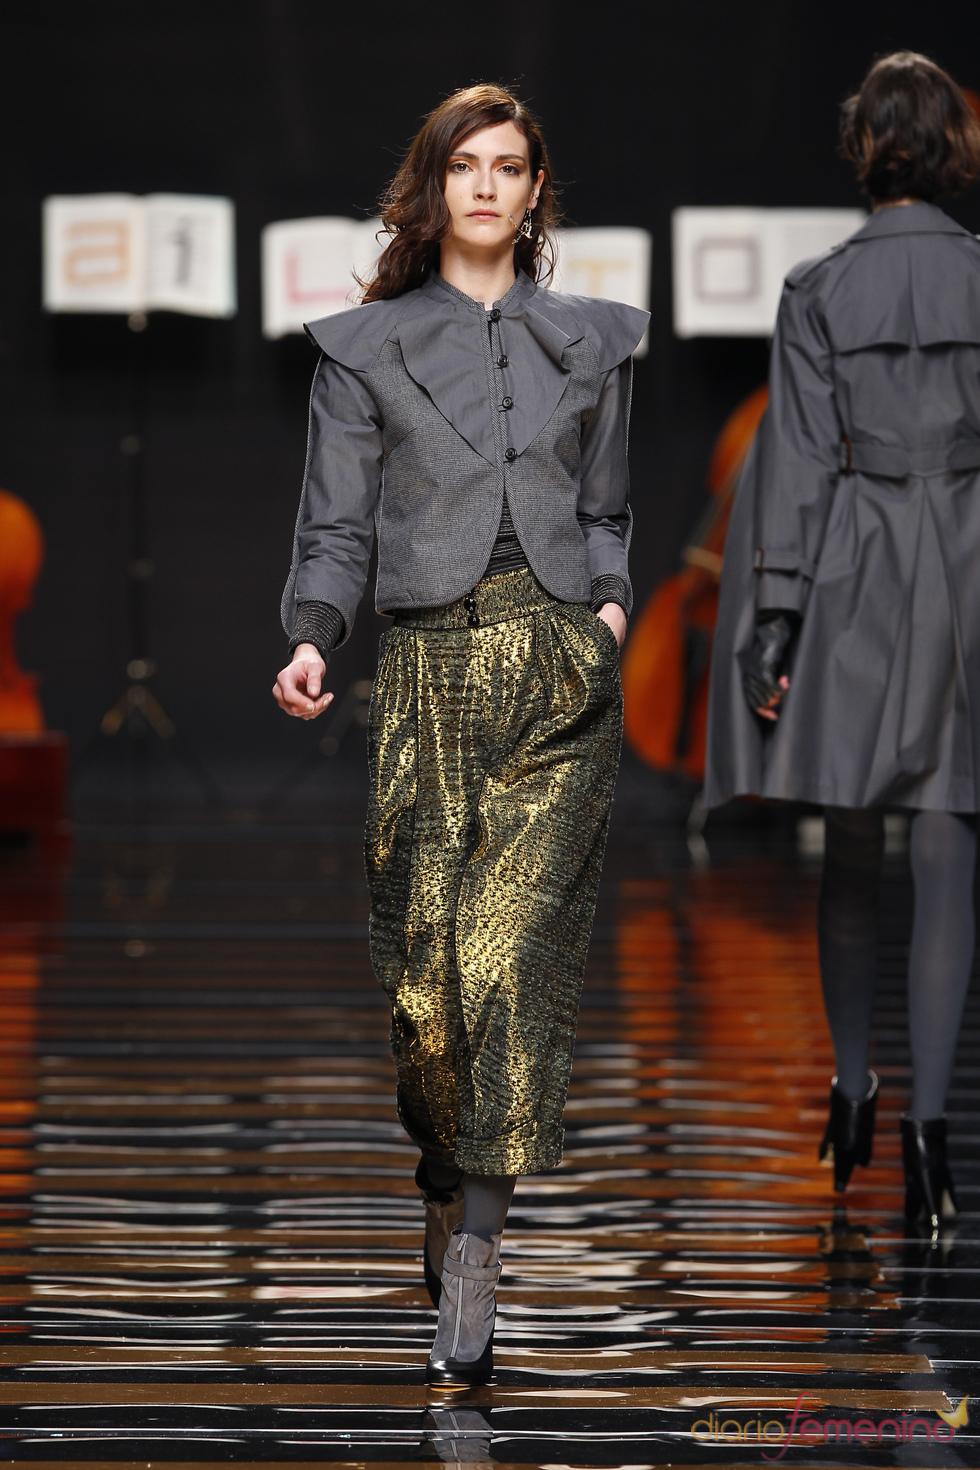 Ailanto viste a la mujer en Cibeles Madrid Fashion Week 2010